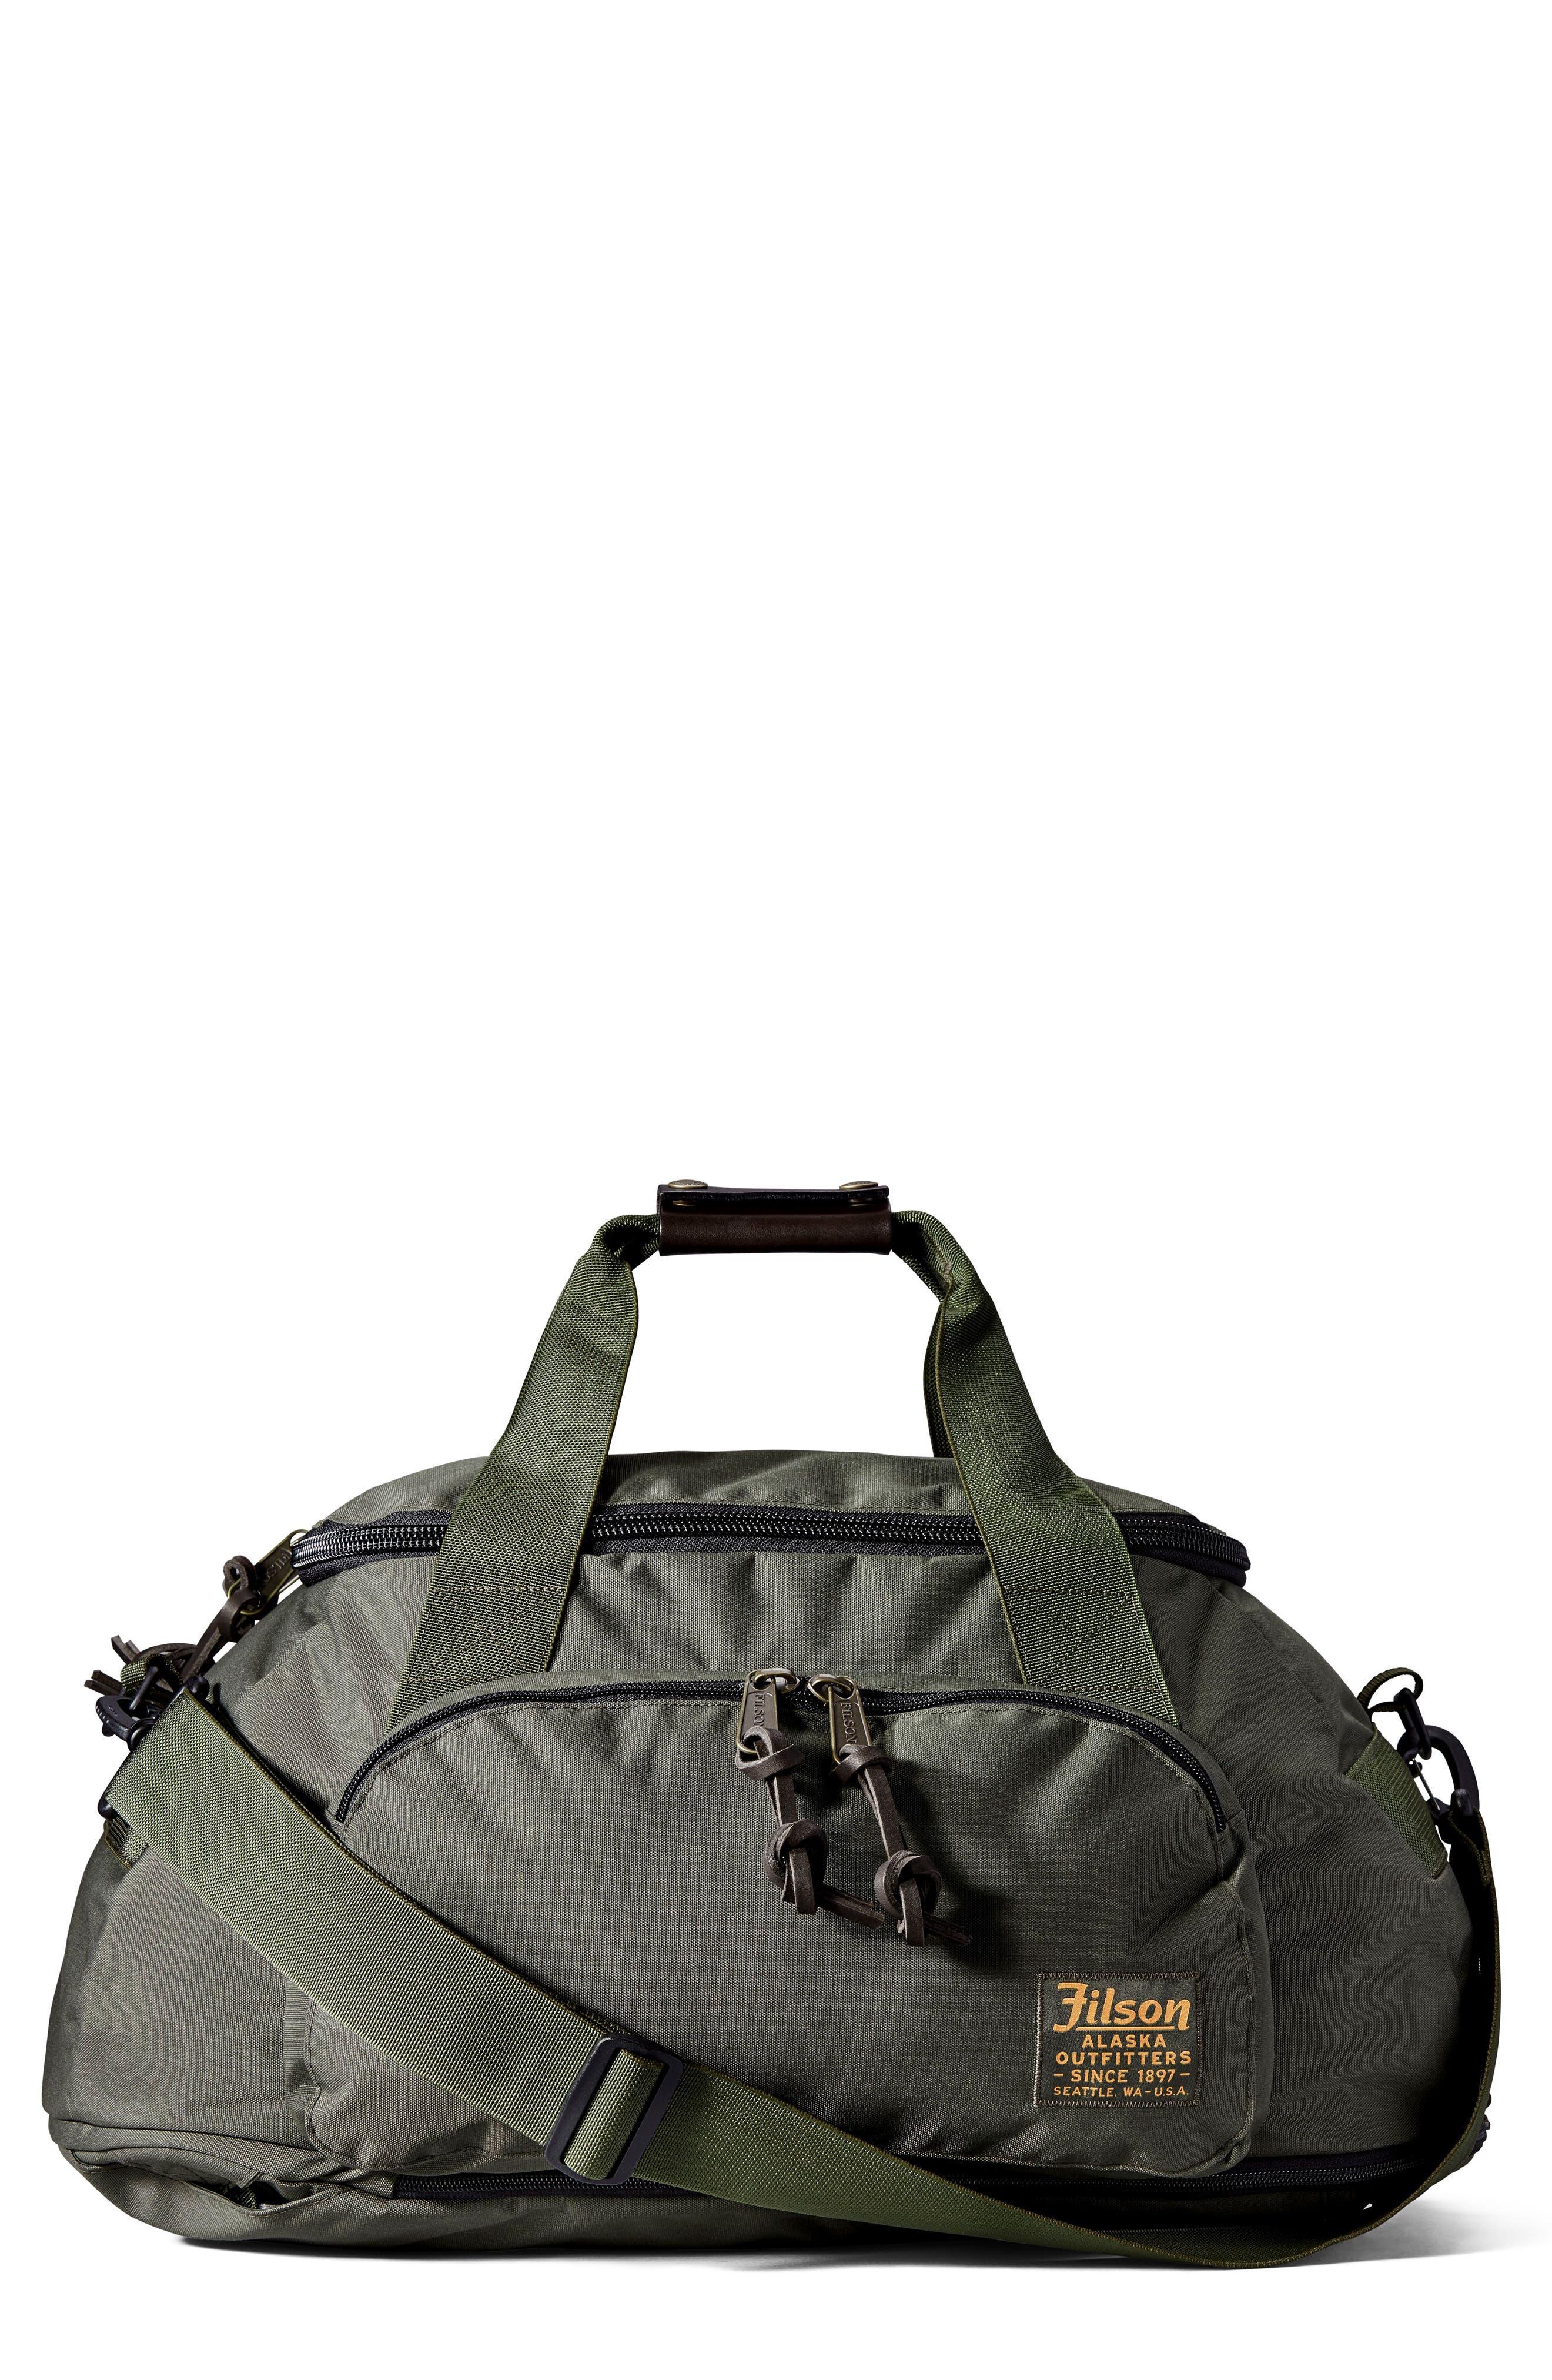 Convertible Duffel Bag,                         Main,                         color, Otter Green